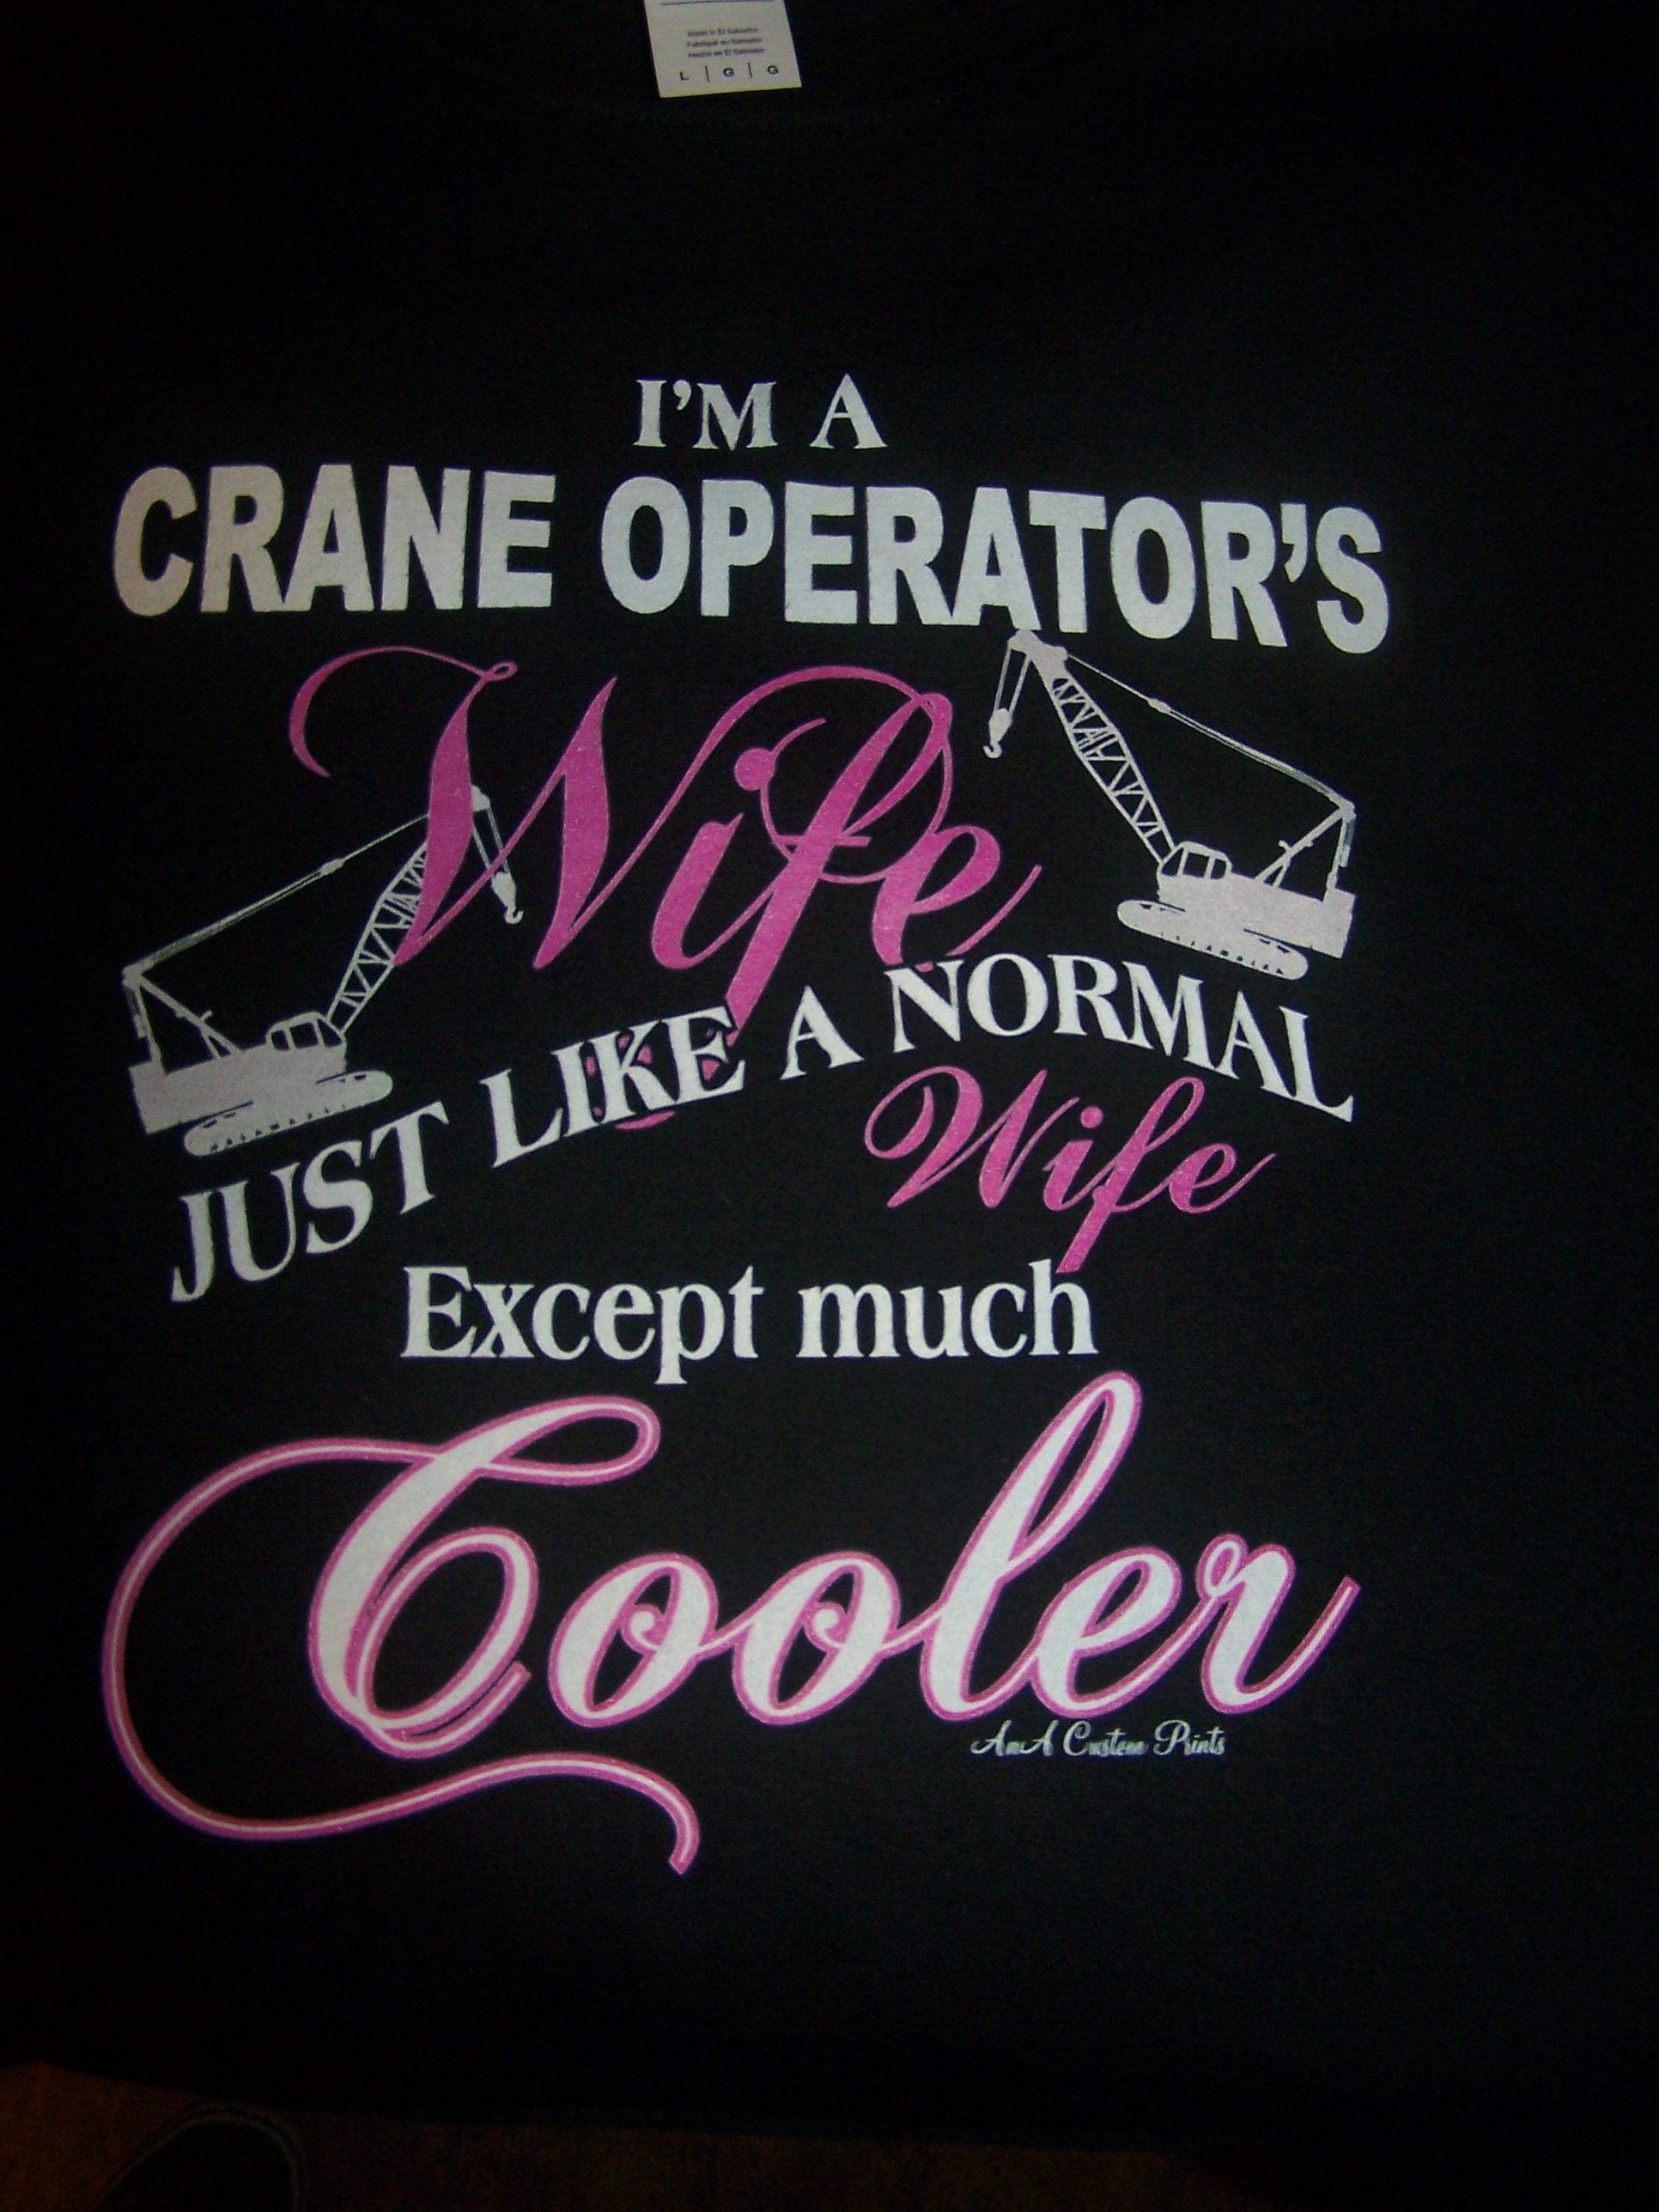 Crane Operator's Wife